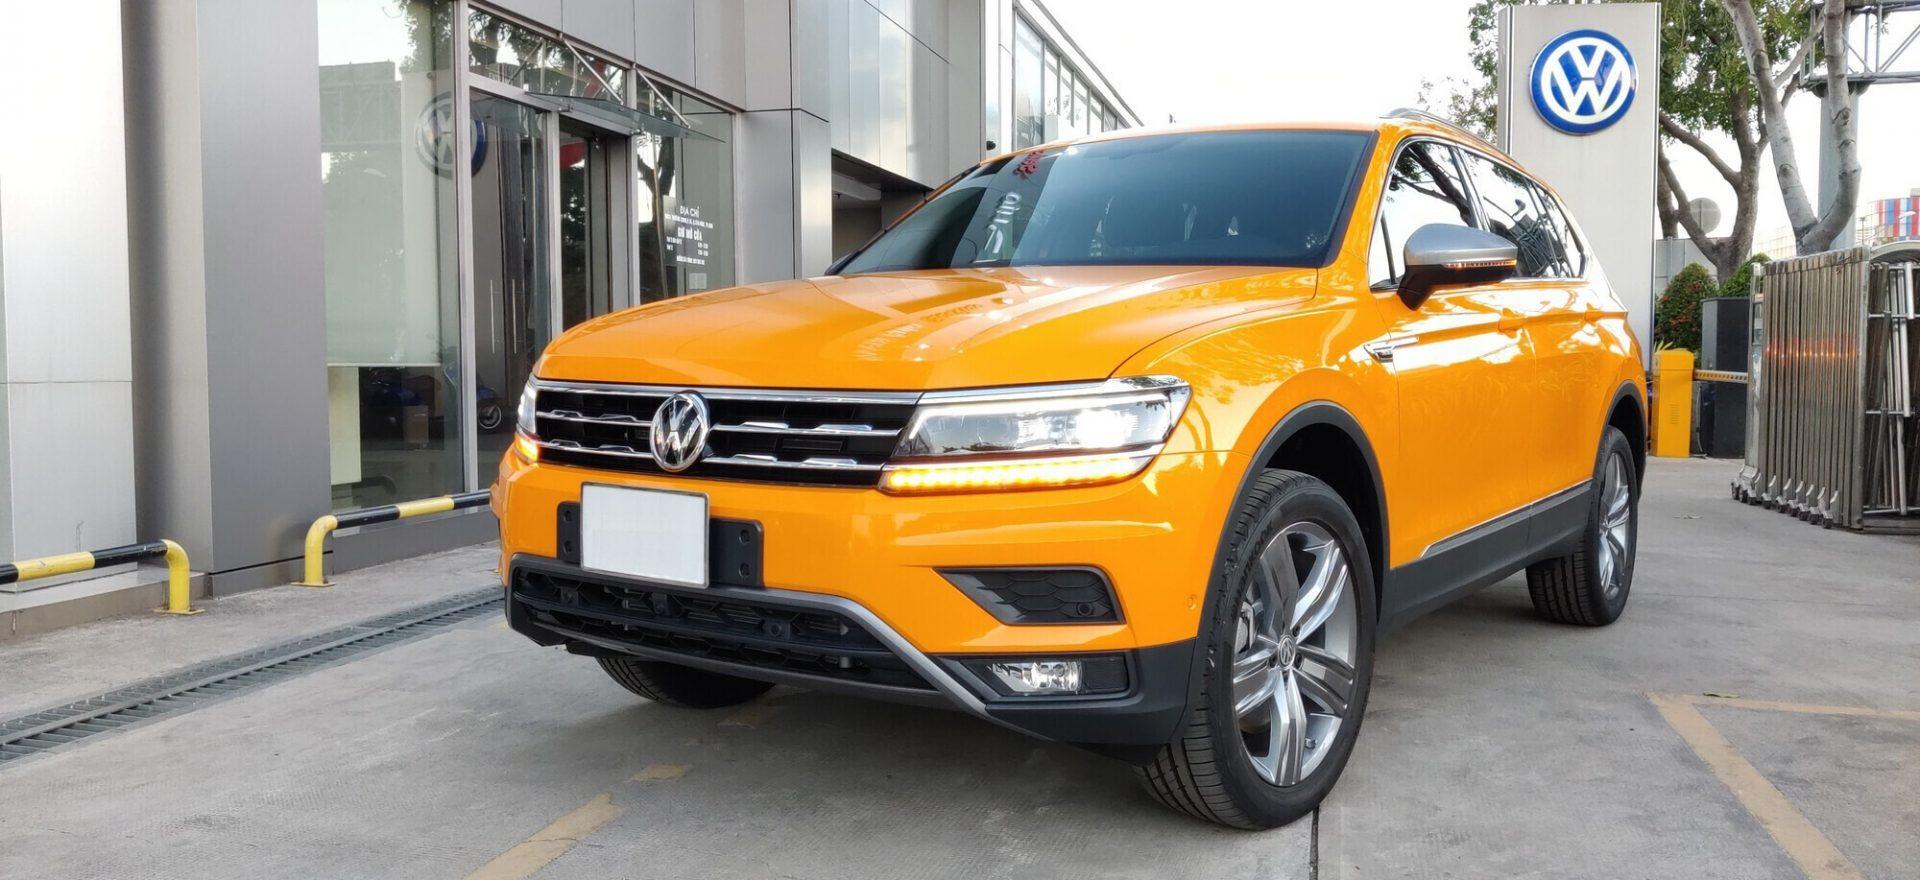 tiguan luxury s 2021 mau vang racing yellow metallic - Volkswagen Sai Gon